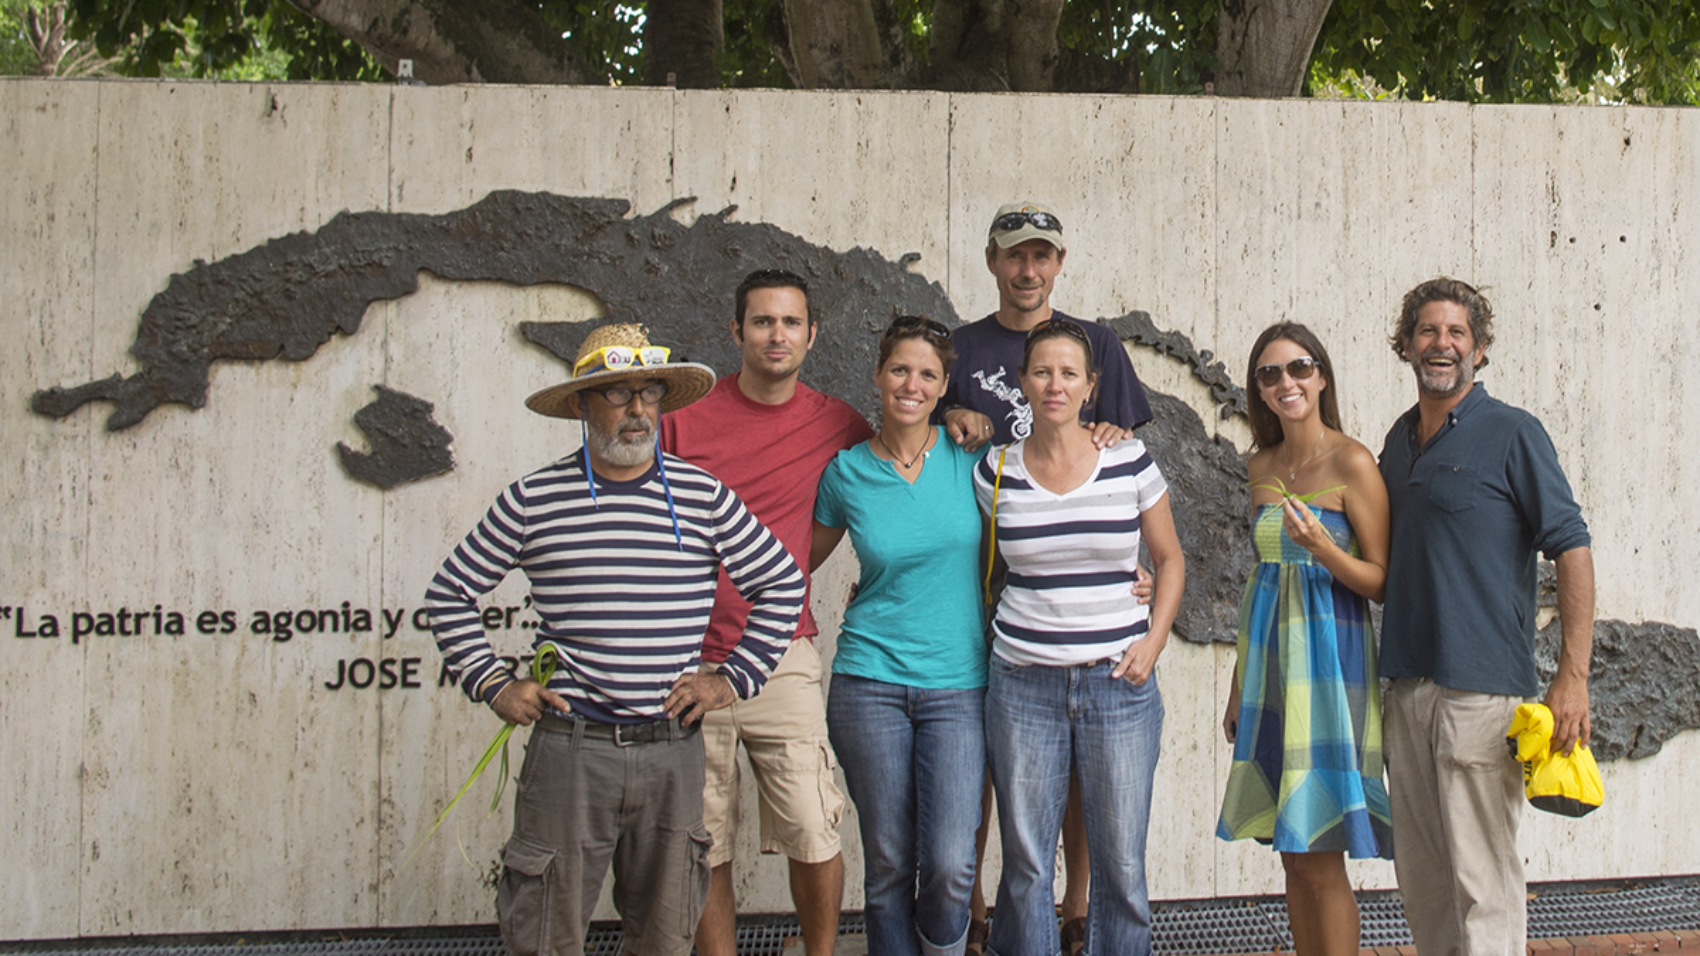 Calle Ocho memorial